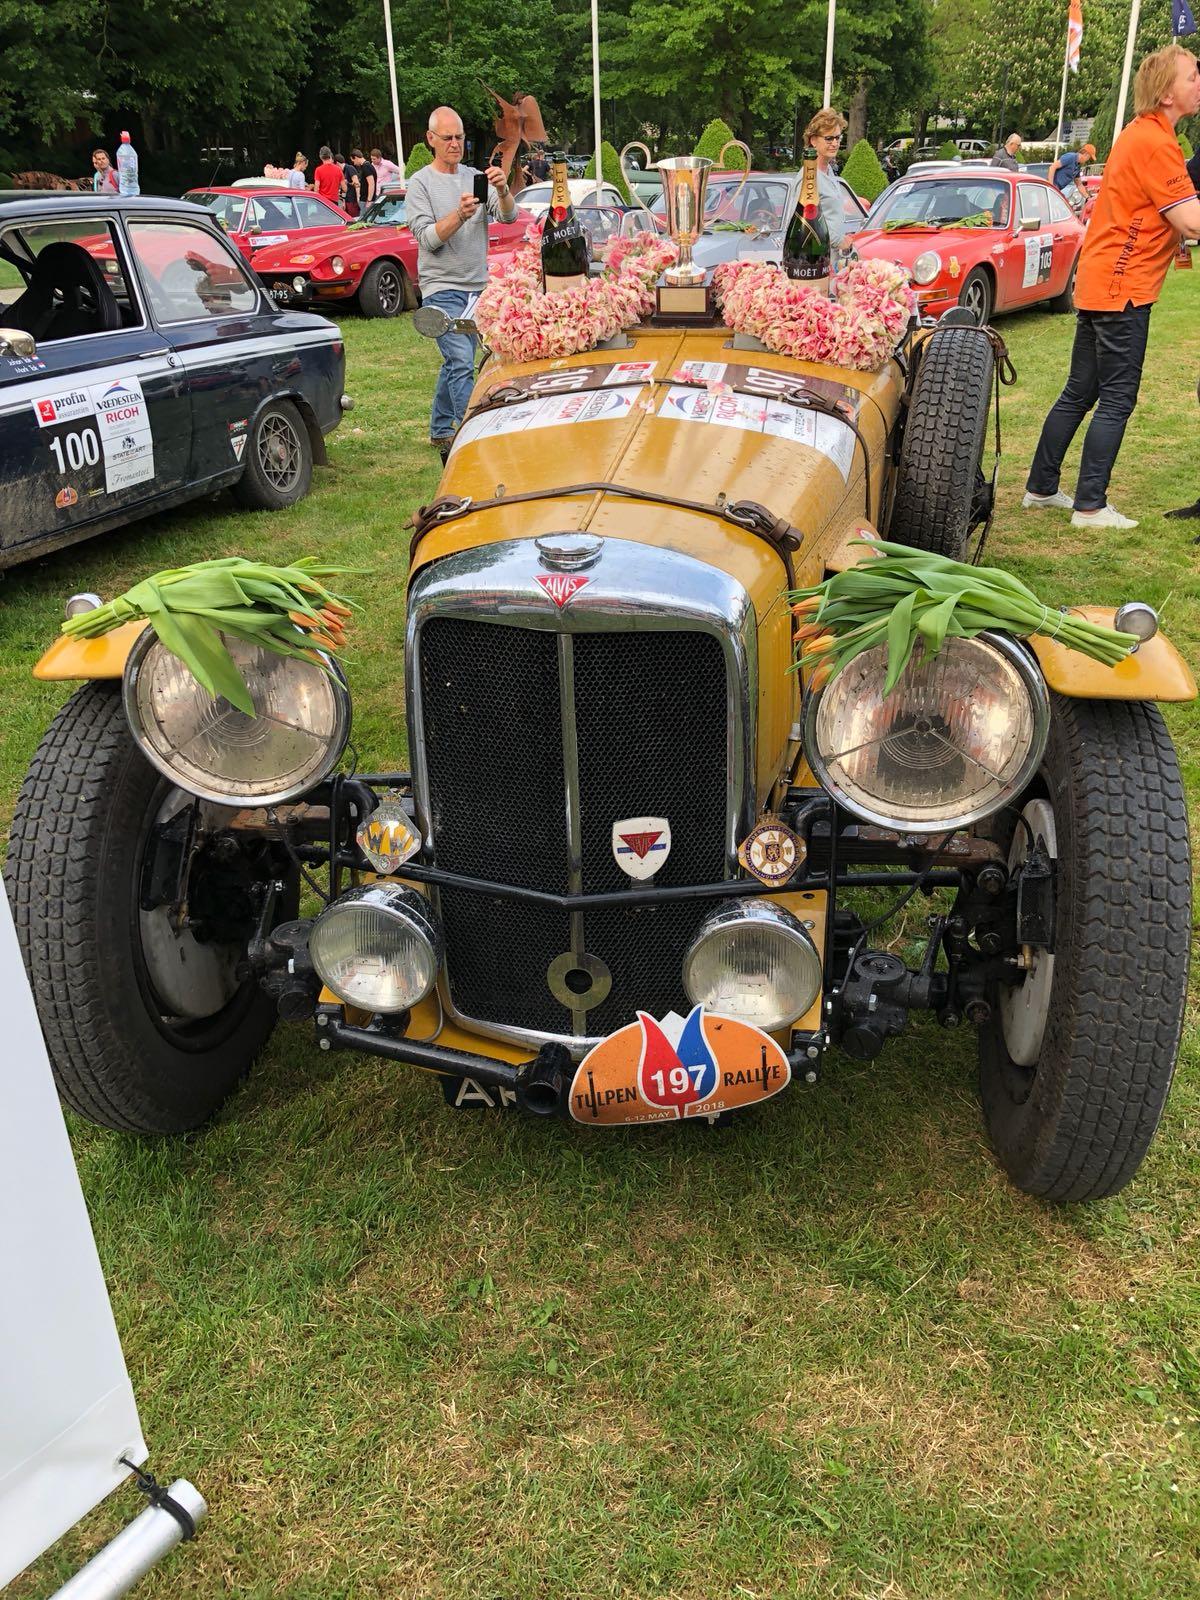 Alvis Speed 25 Special after winning the 2018 Tulpen Rallye.